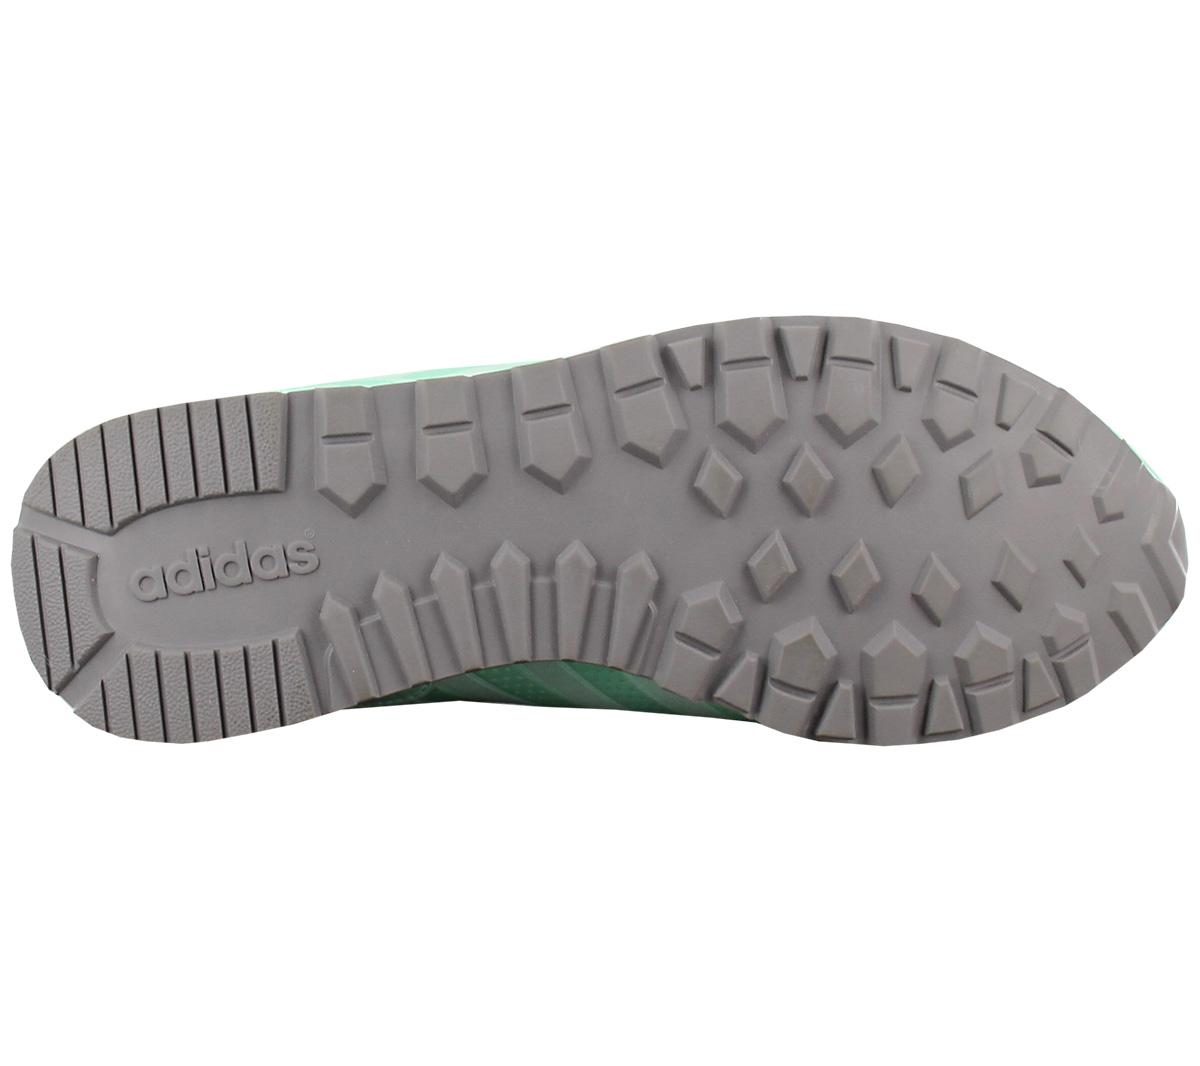 Details zu adidas 10K Casual W Damen Sneaker Fashion Schuhe Mint Grün Turnschuhe AW5178